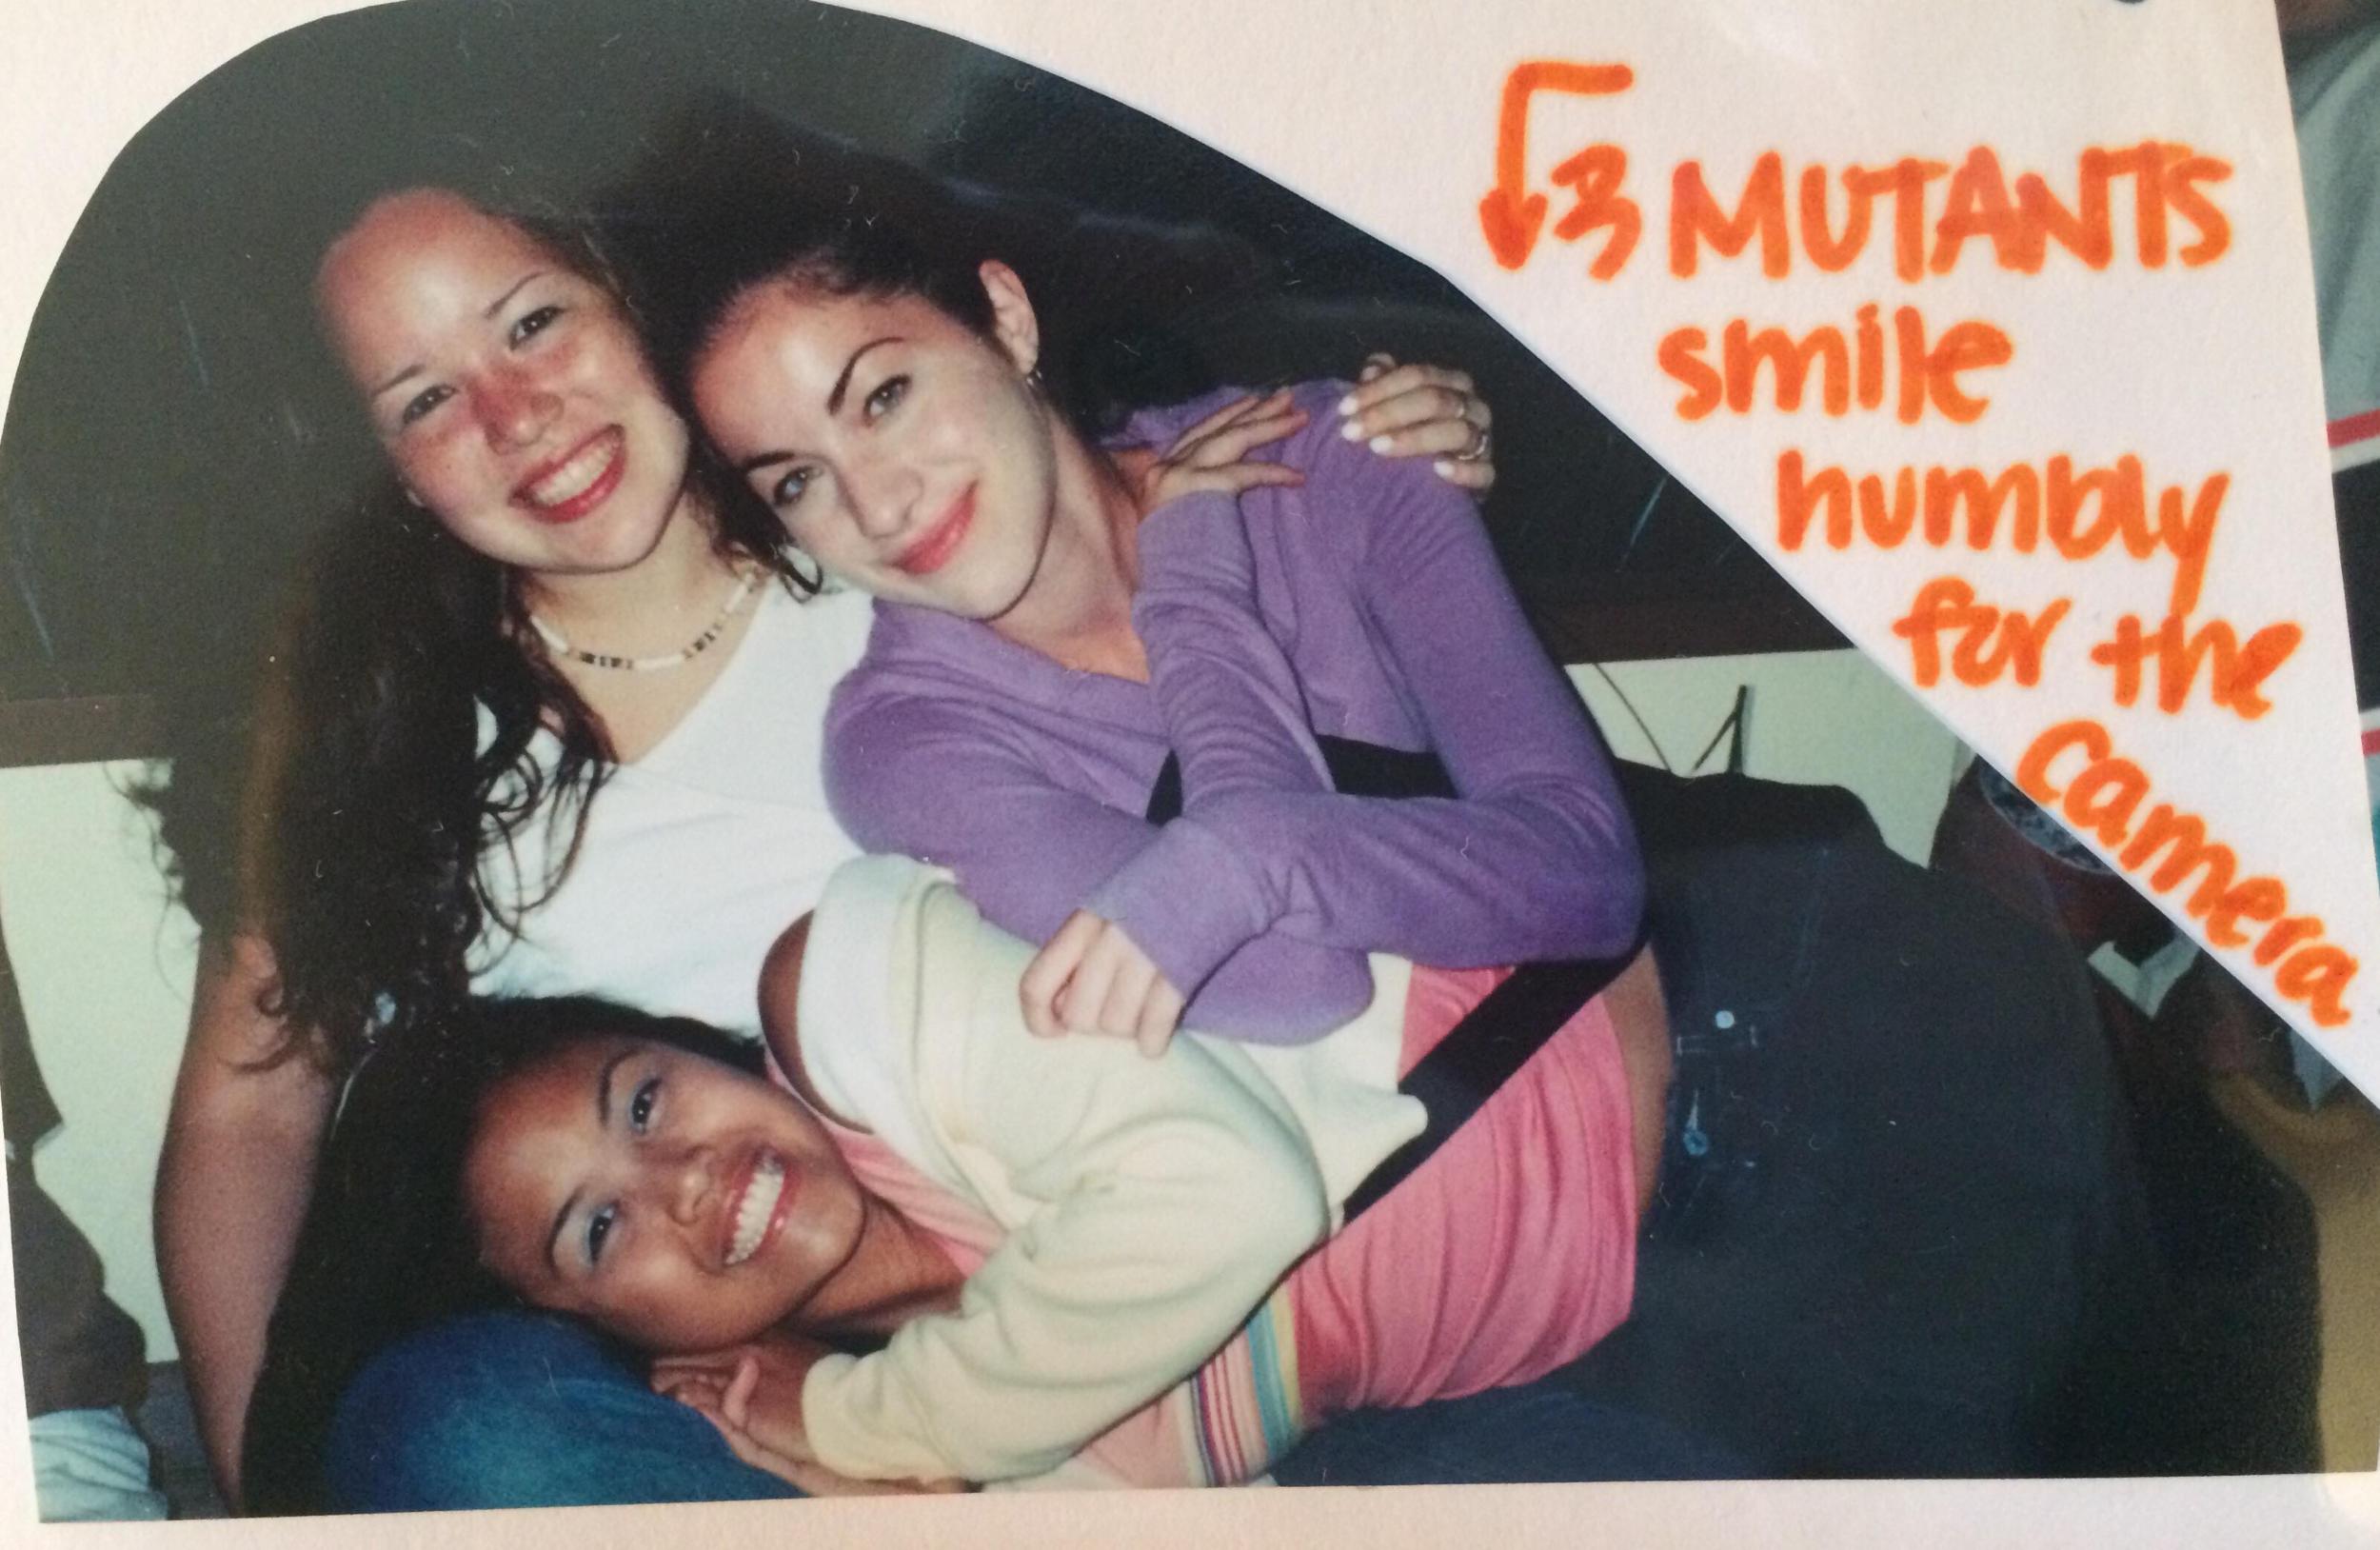 Three Mutants on a high school retreat. An excerpt from my senior year scrapbook.